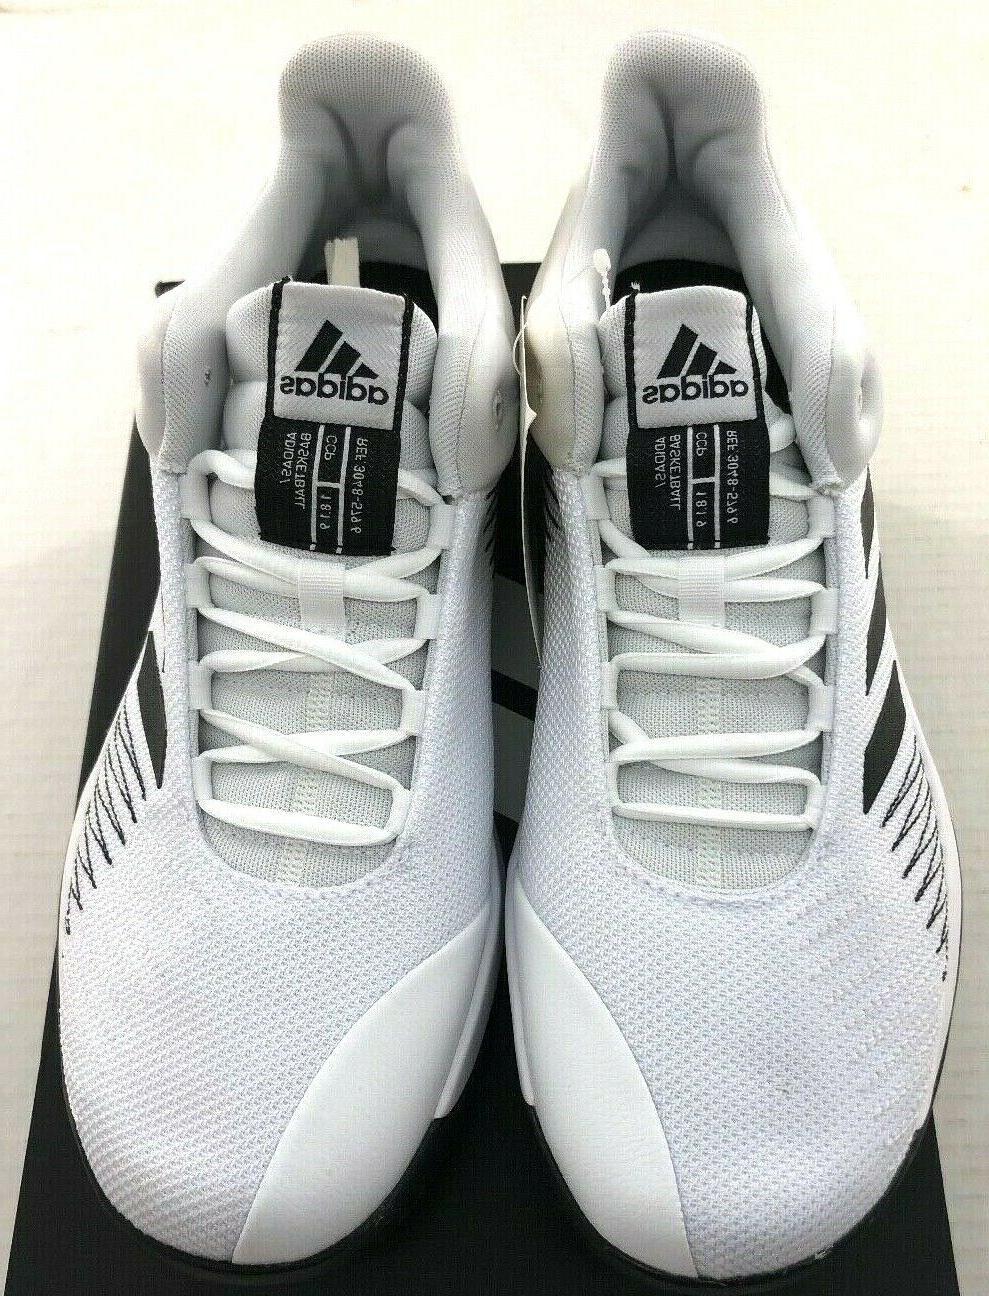 Adidas 2018 Shoes AP9838